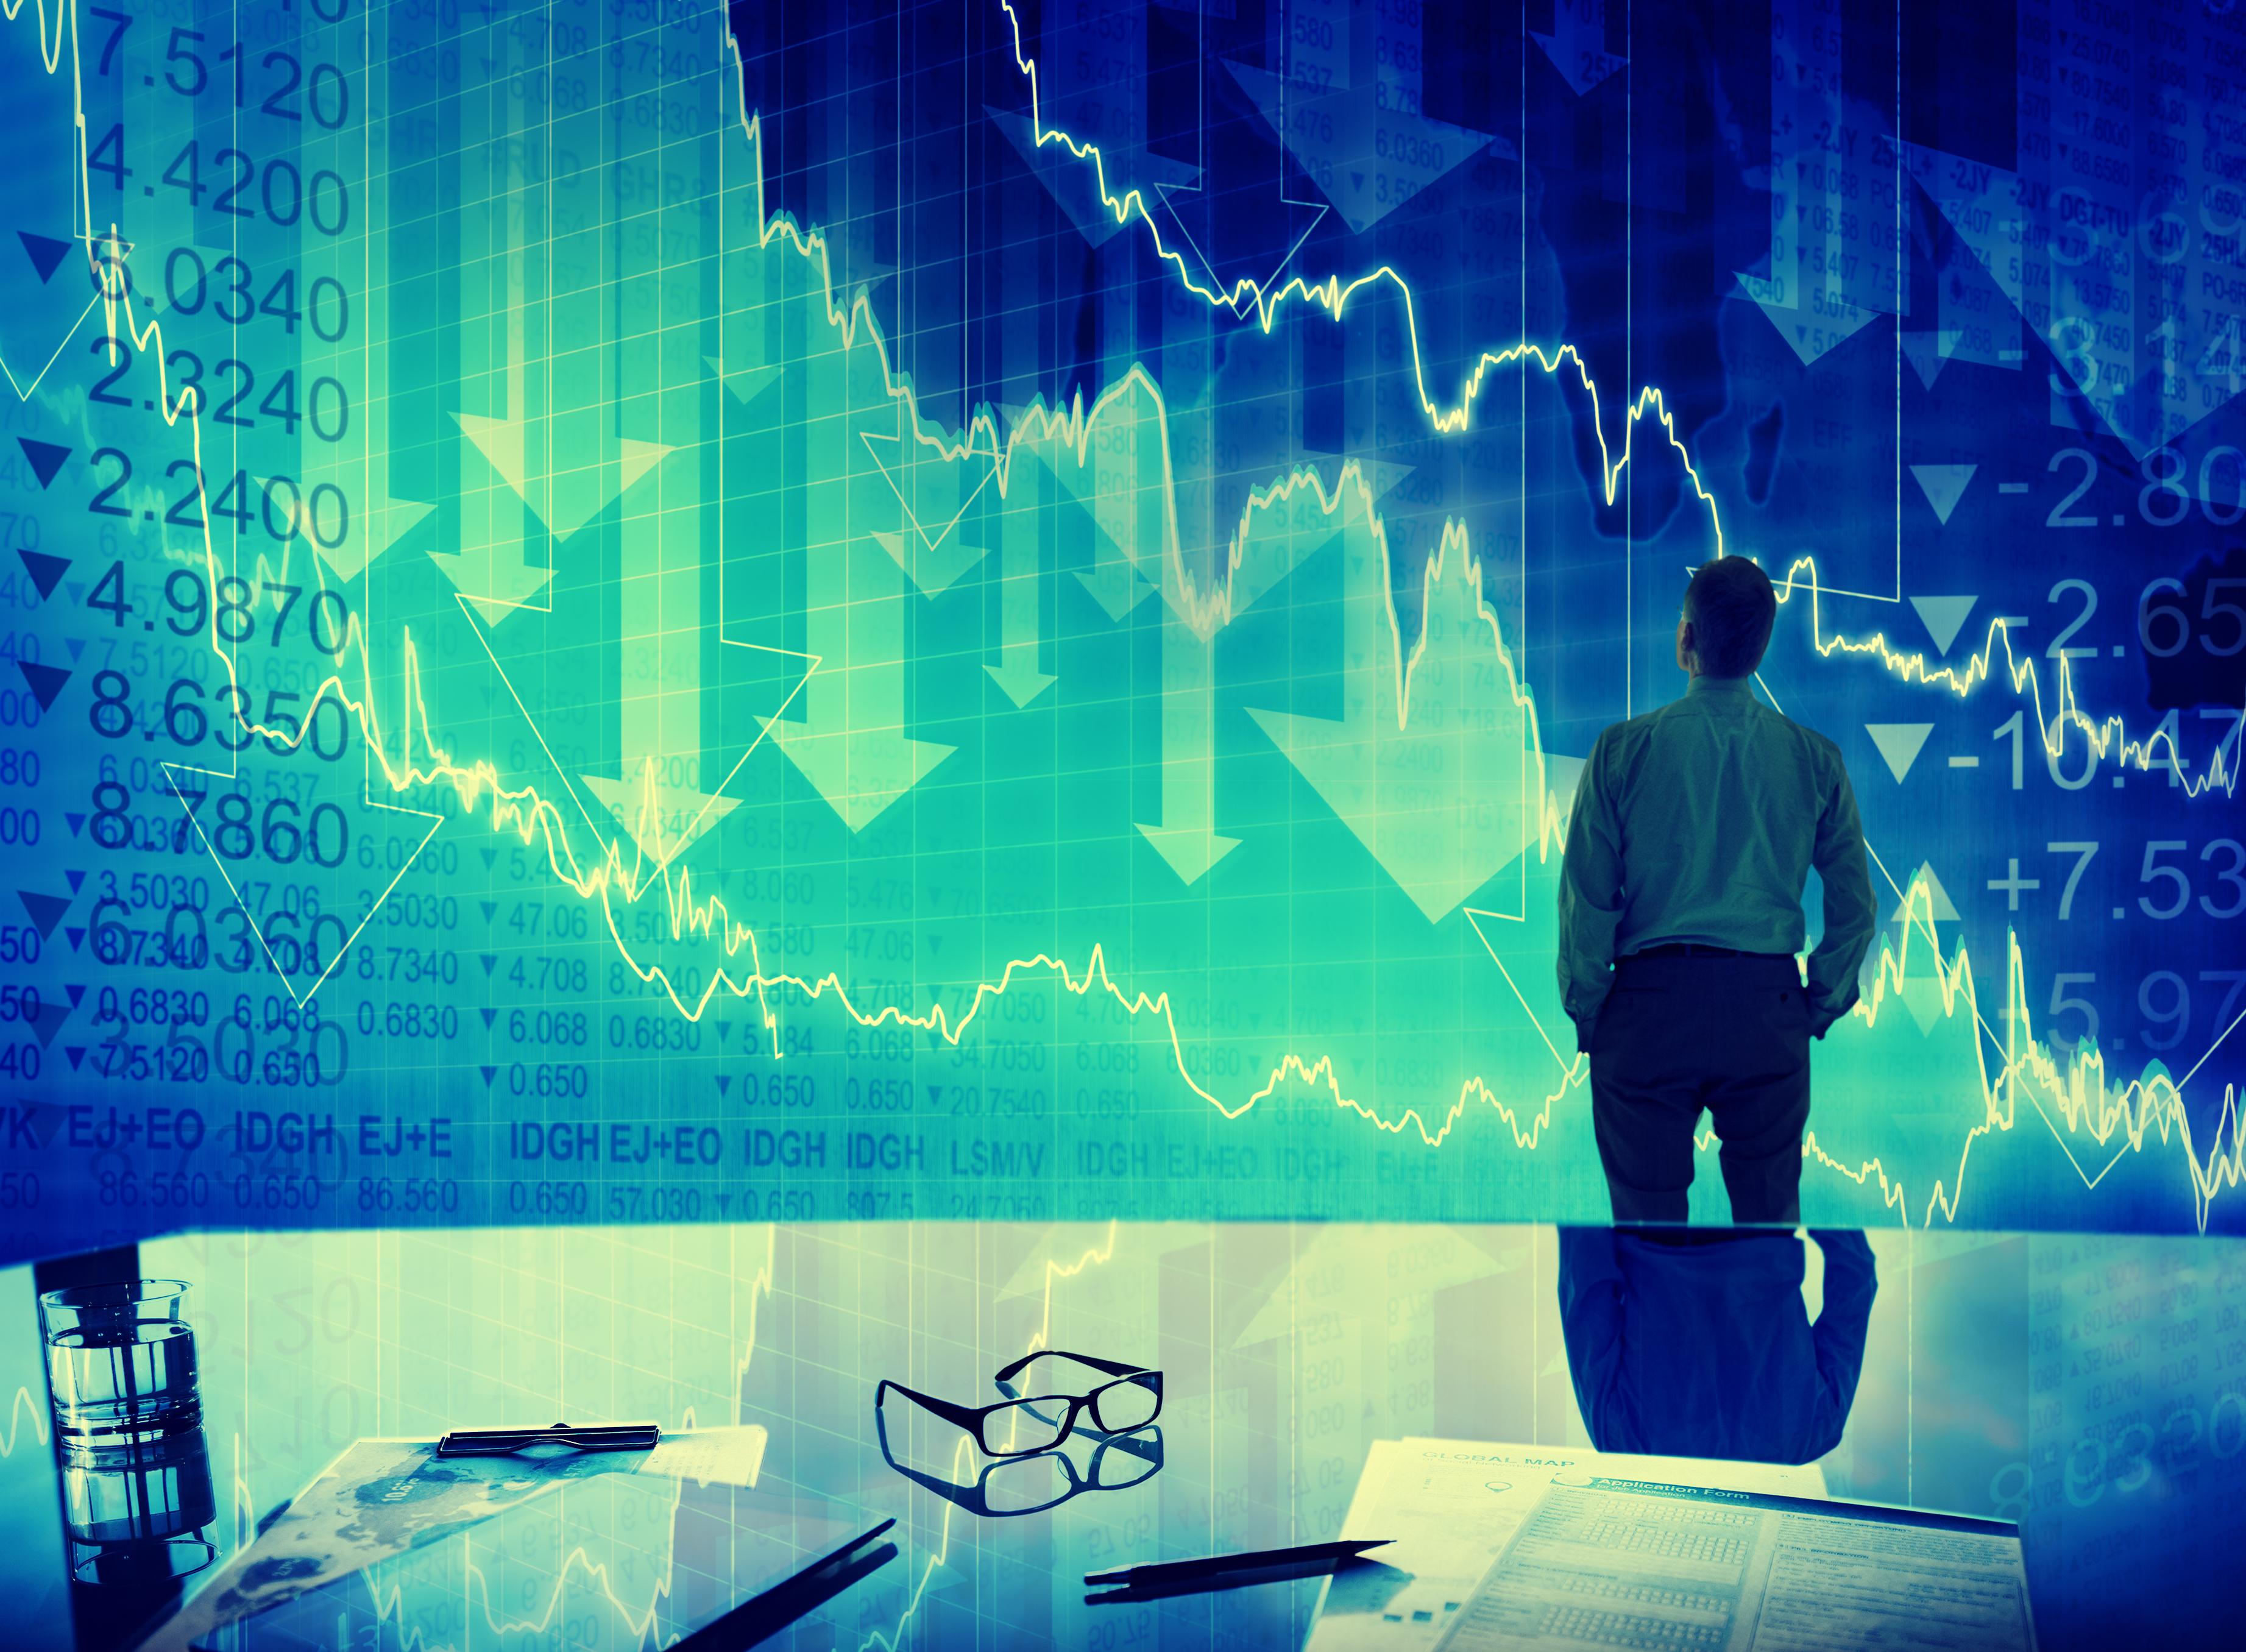 3 Tips to Prepare for a Crashing Market | The Motley Fool